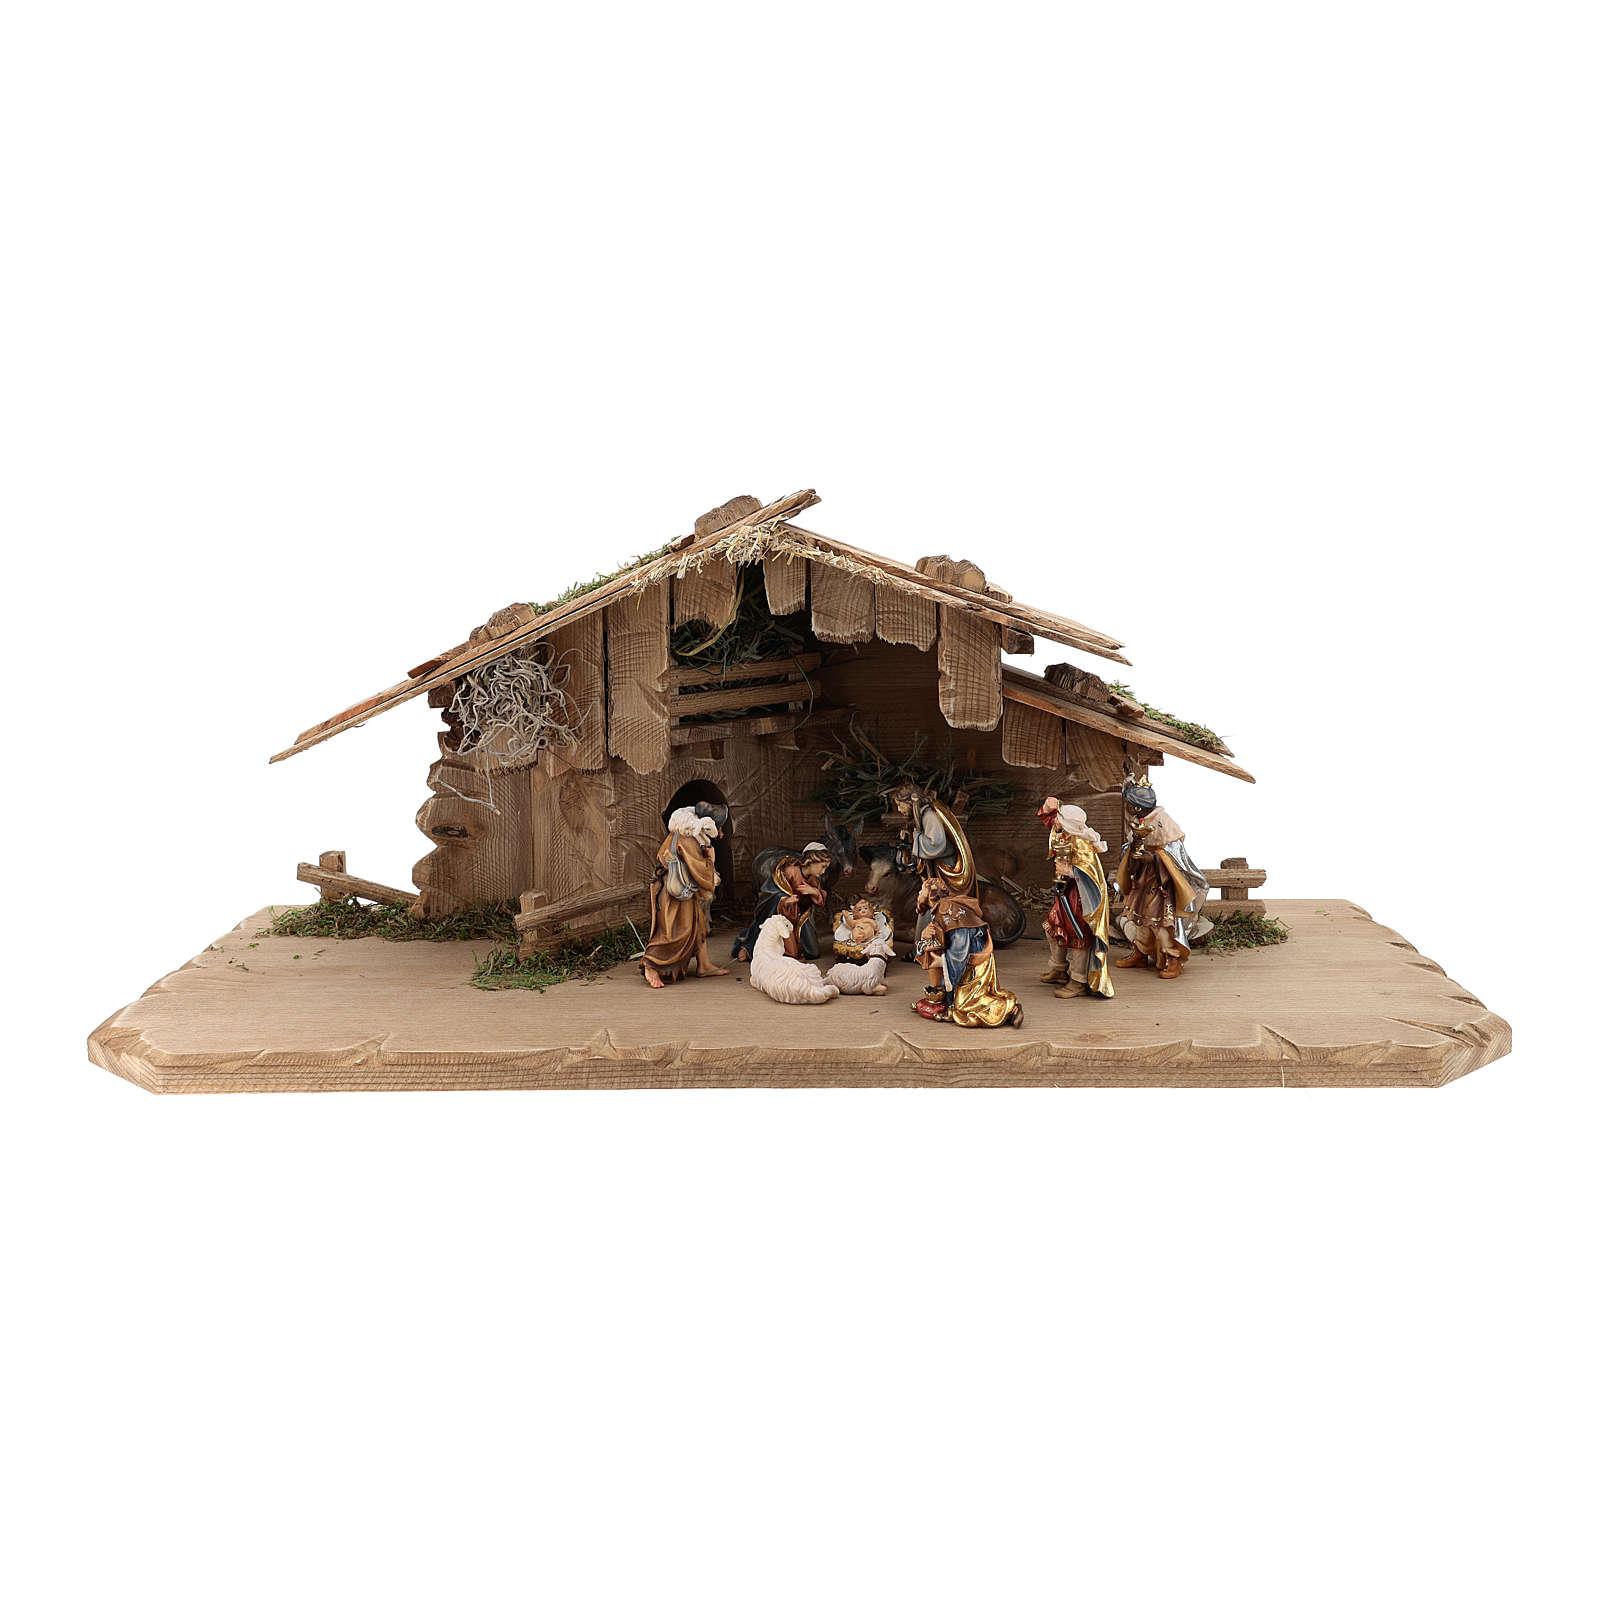 Capanna Notte Sacra set 12 pezzi legno dipinto presepe Rainell 9 cm 4